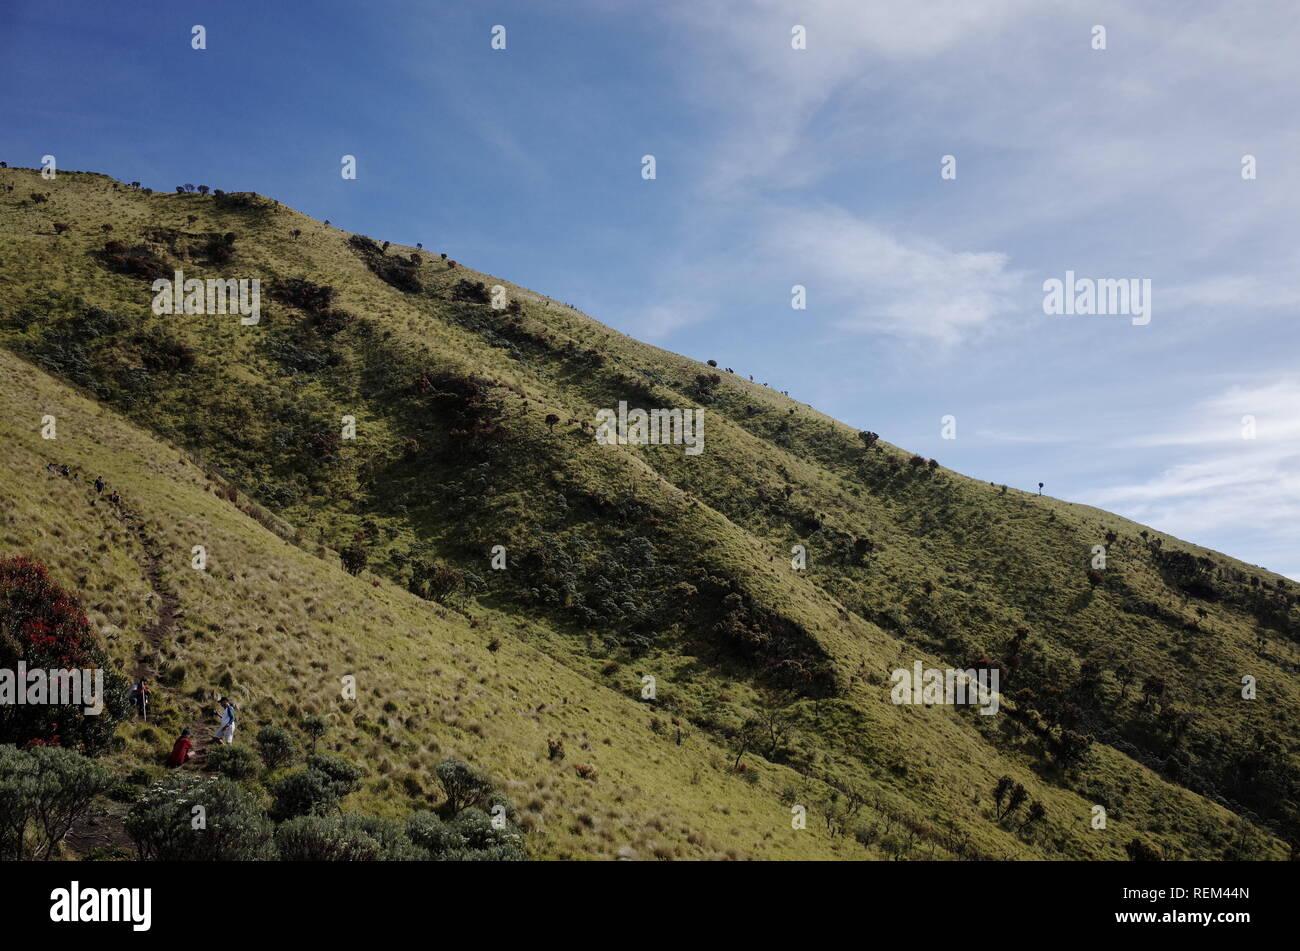 Mount Merbabu Scenary - Stock Image